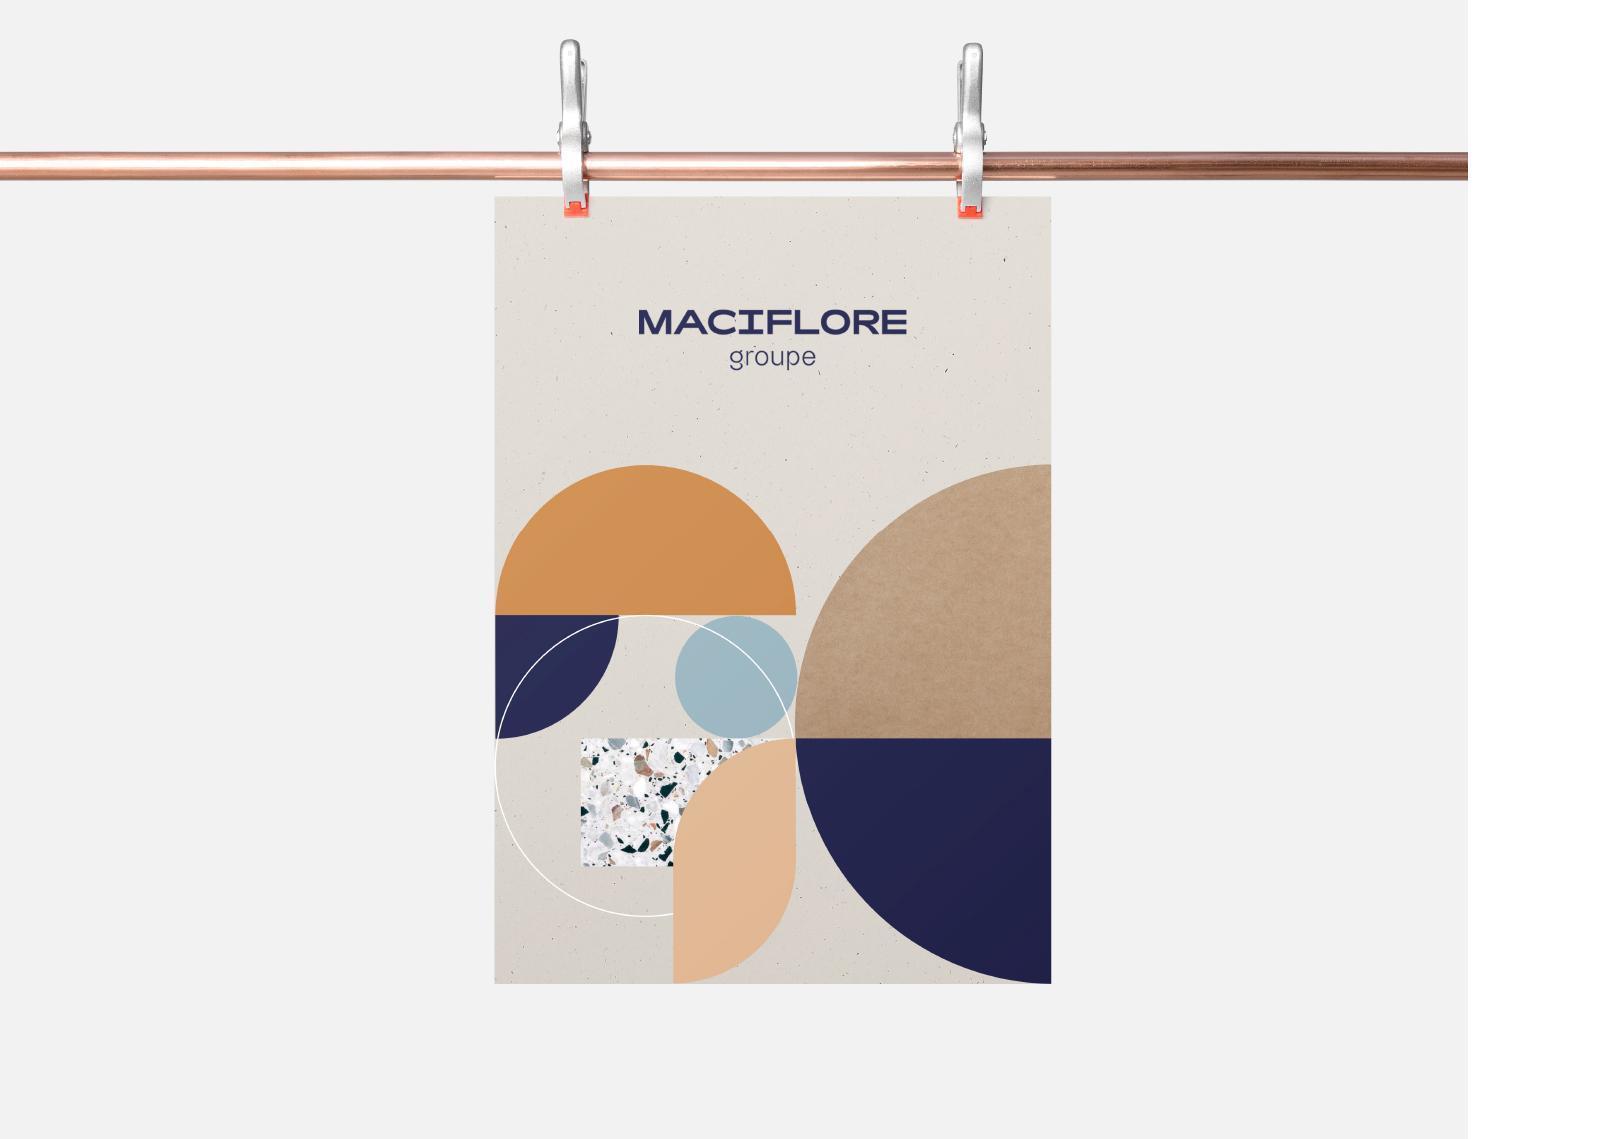 MACIFLORE12